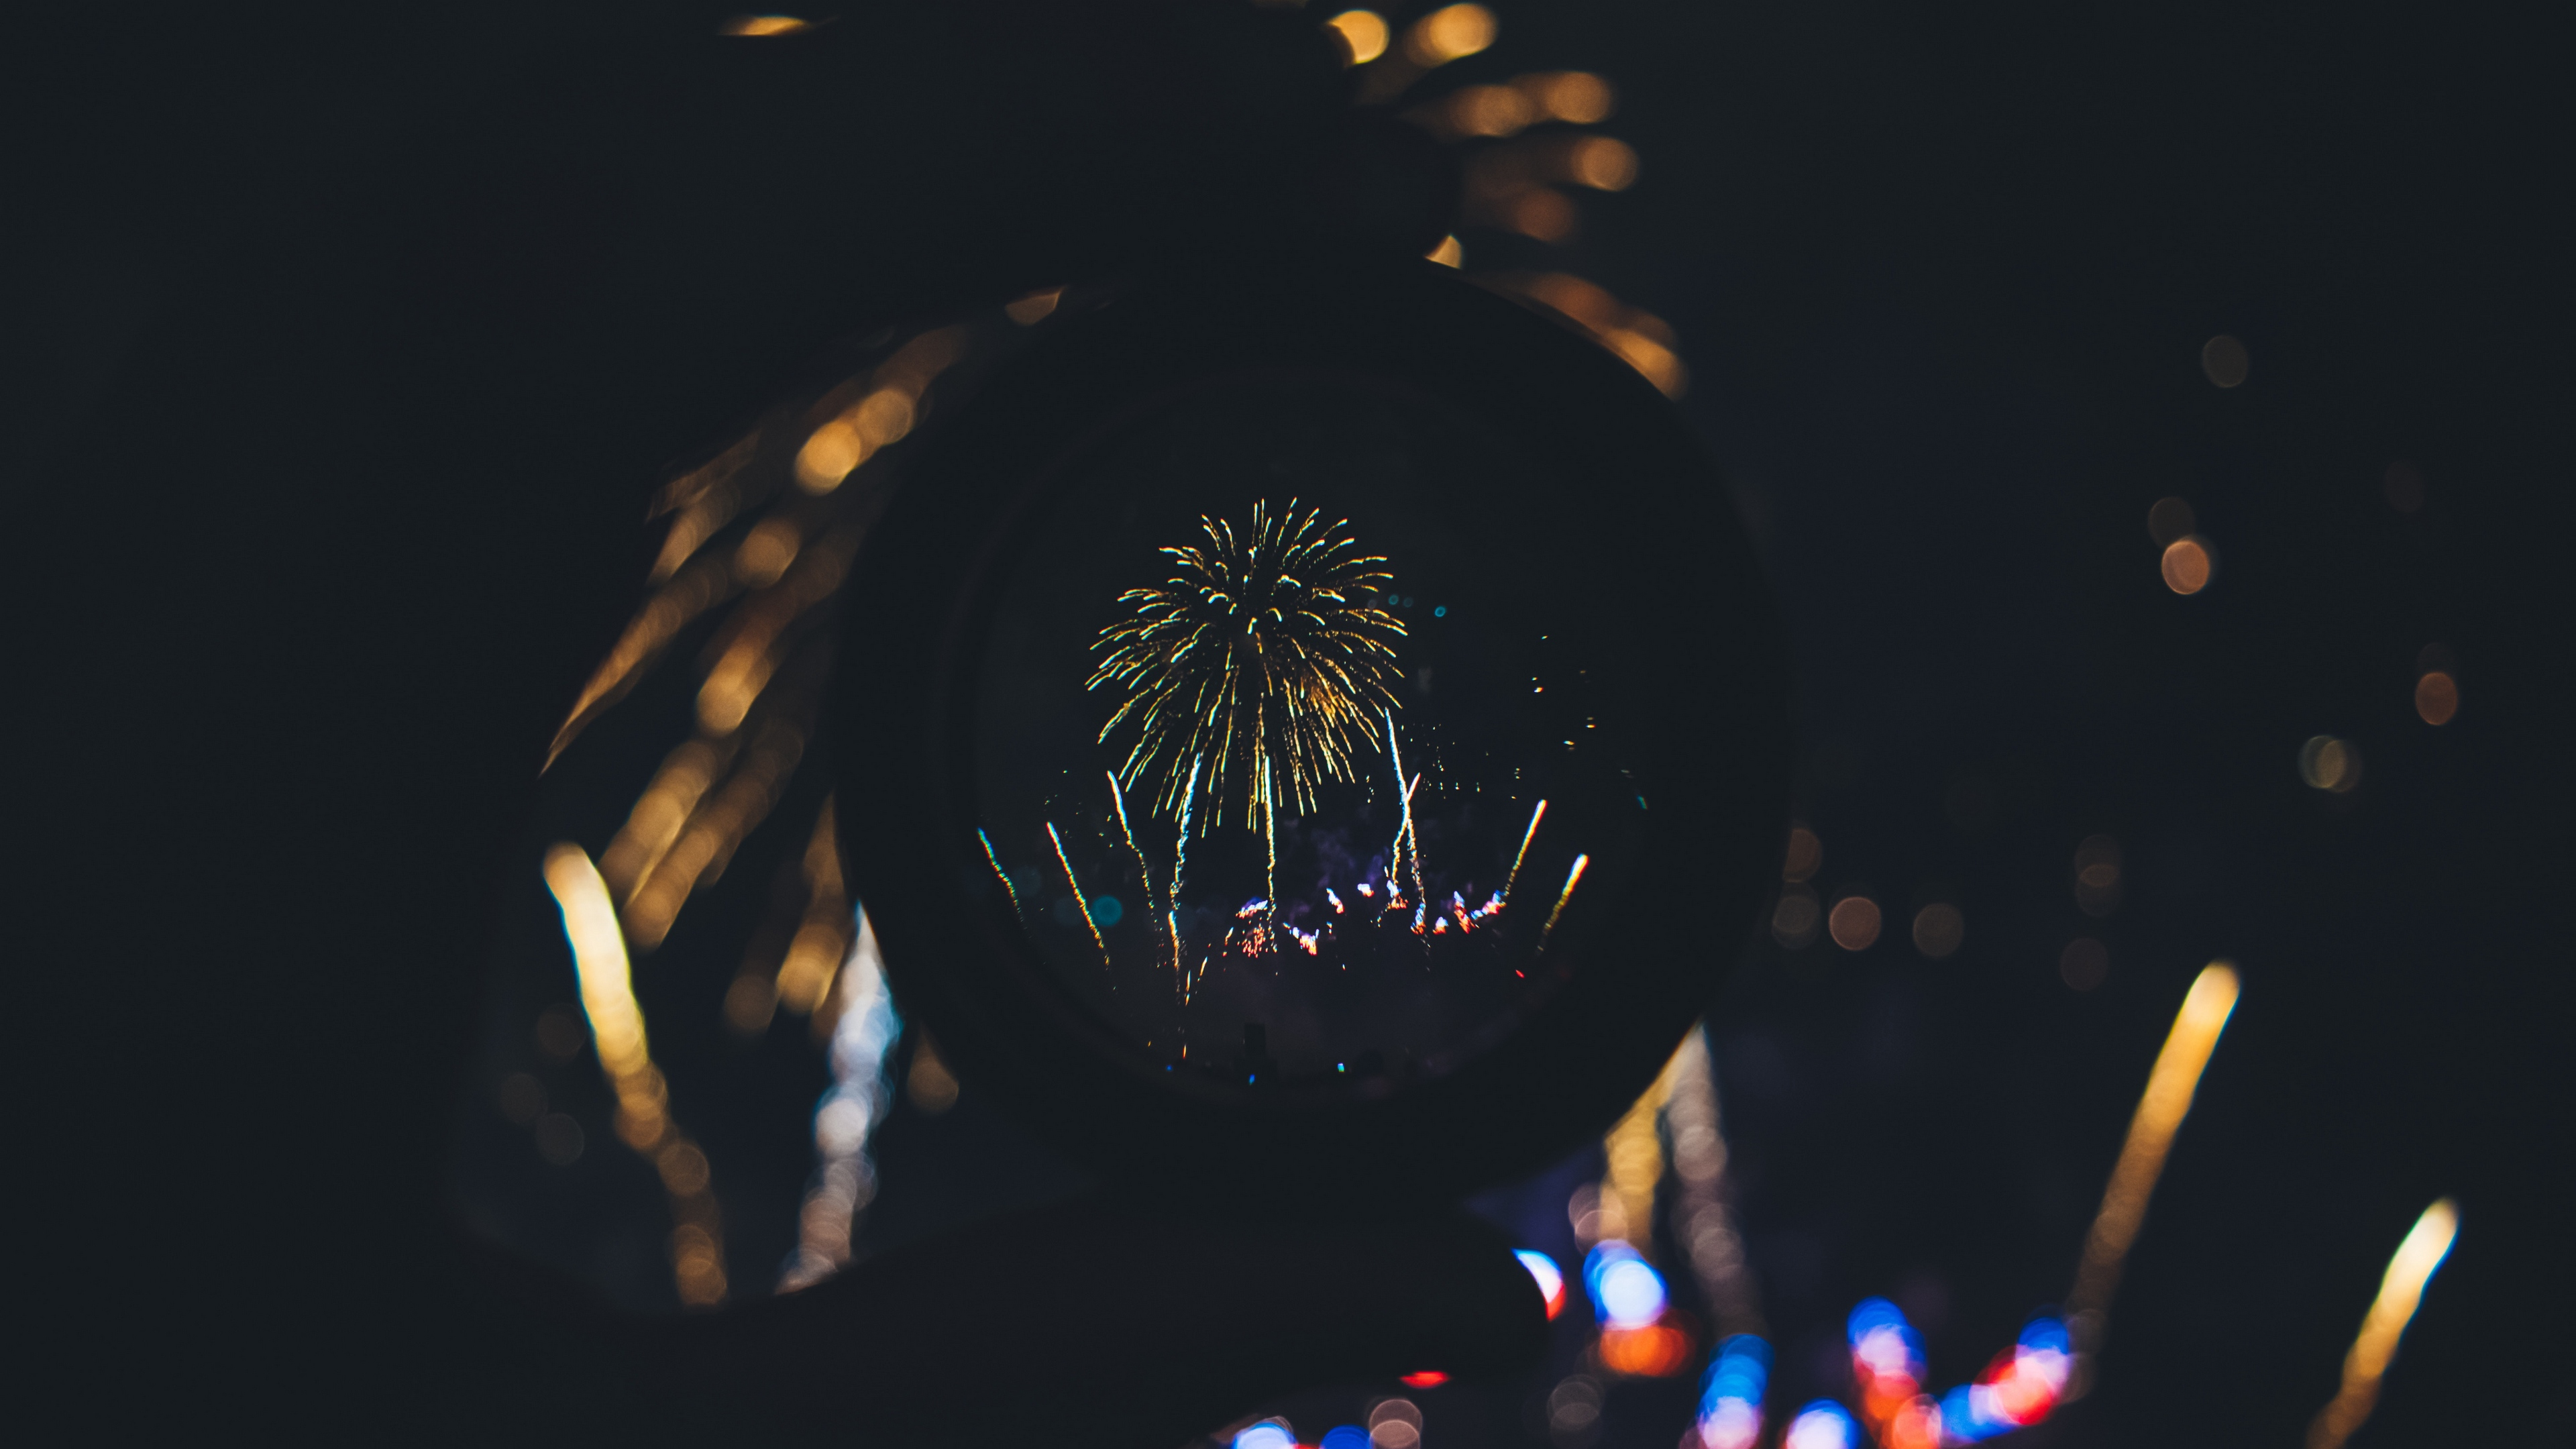 salute fireworks lens holiday 4k 1538345137 - salute, fireworks, lens, holiday 4k - salute, lens, Fireworks